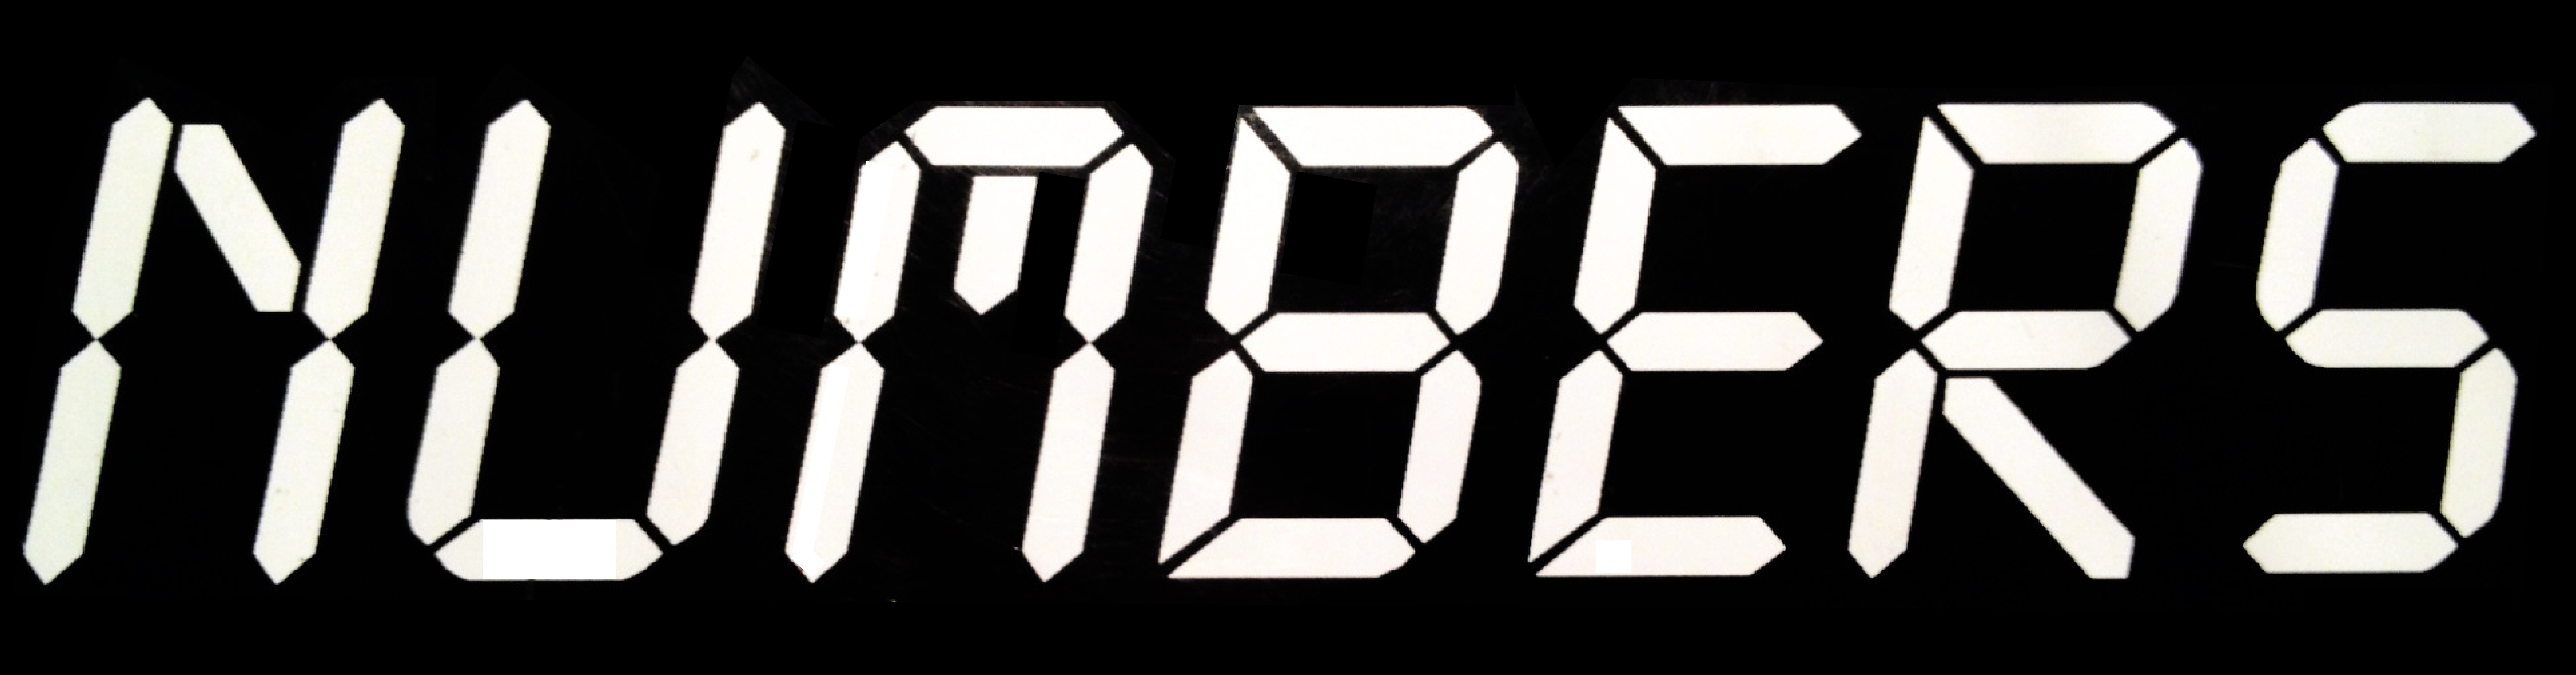 numberslogohires